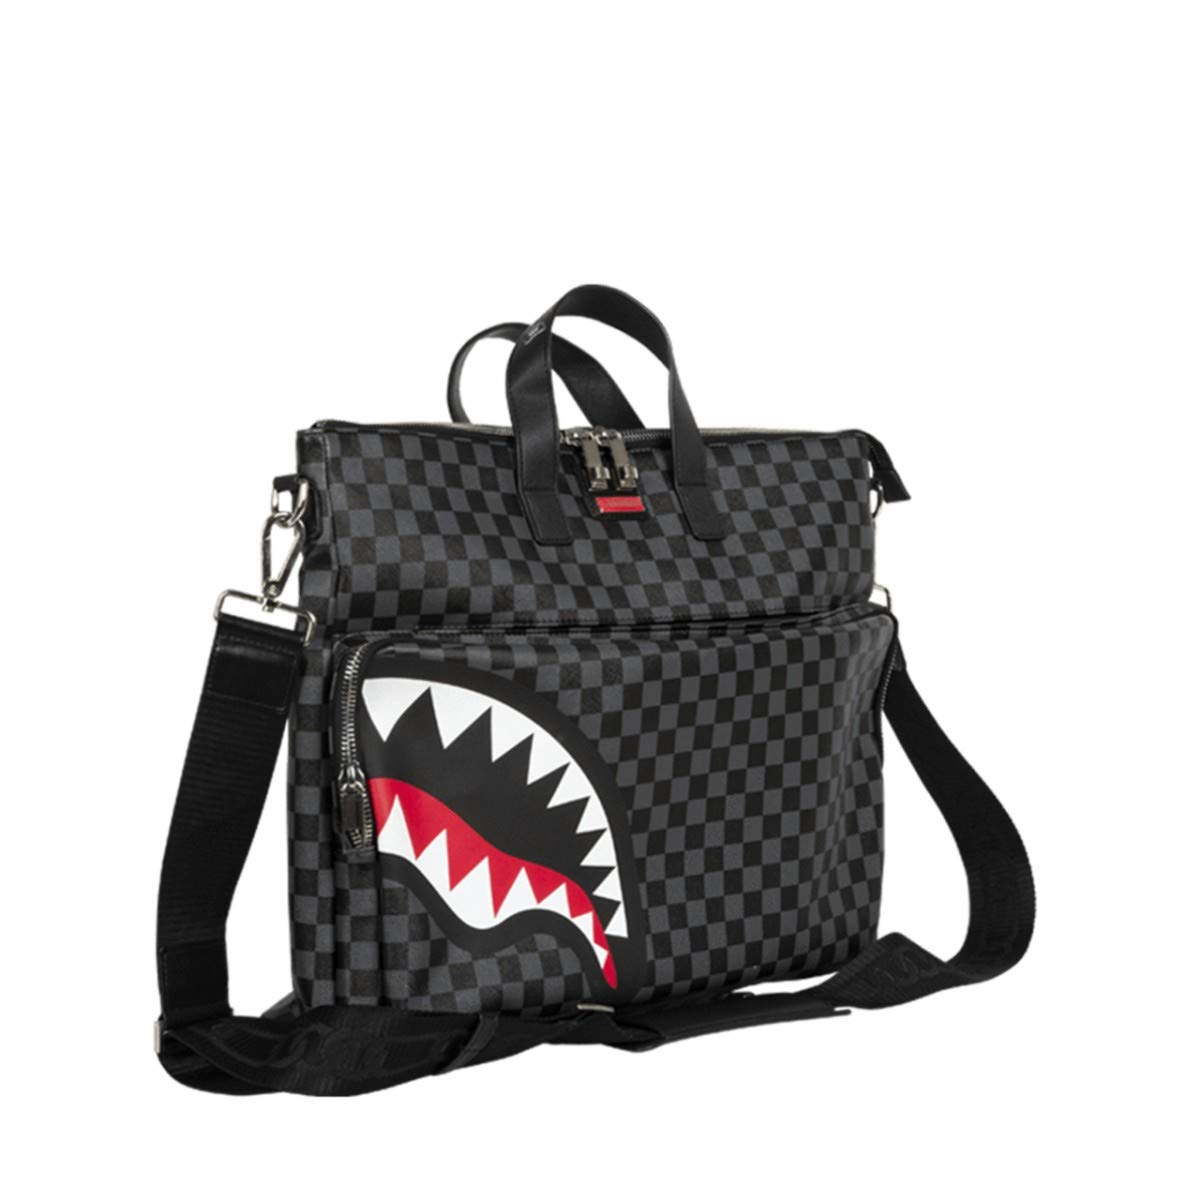 Sprayground Sharks in Paris Black Grey Checker Travel Festival Bag by Sprayground (Image #2)